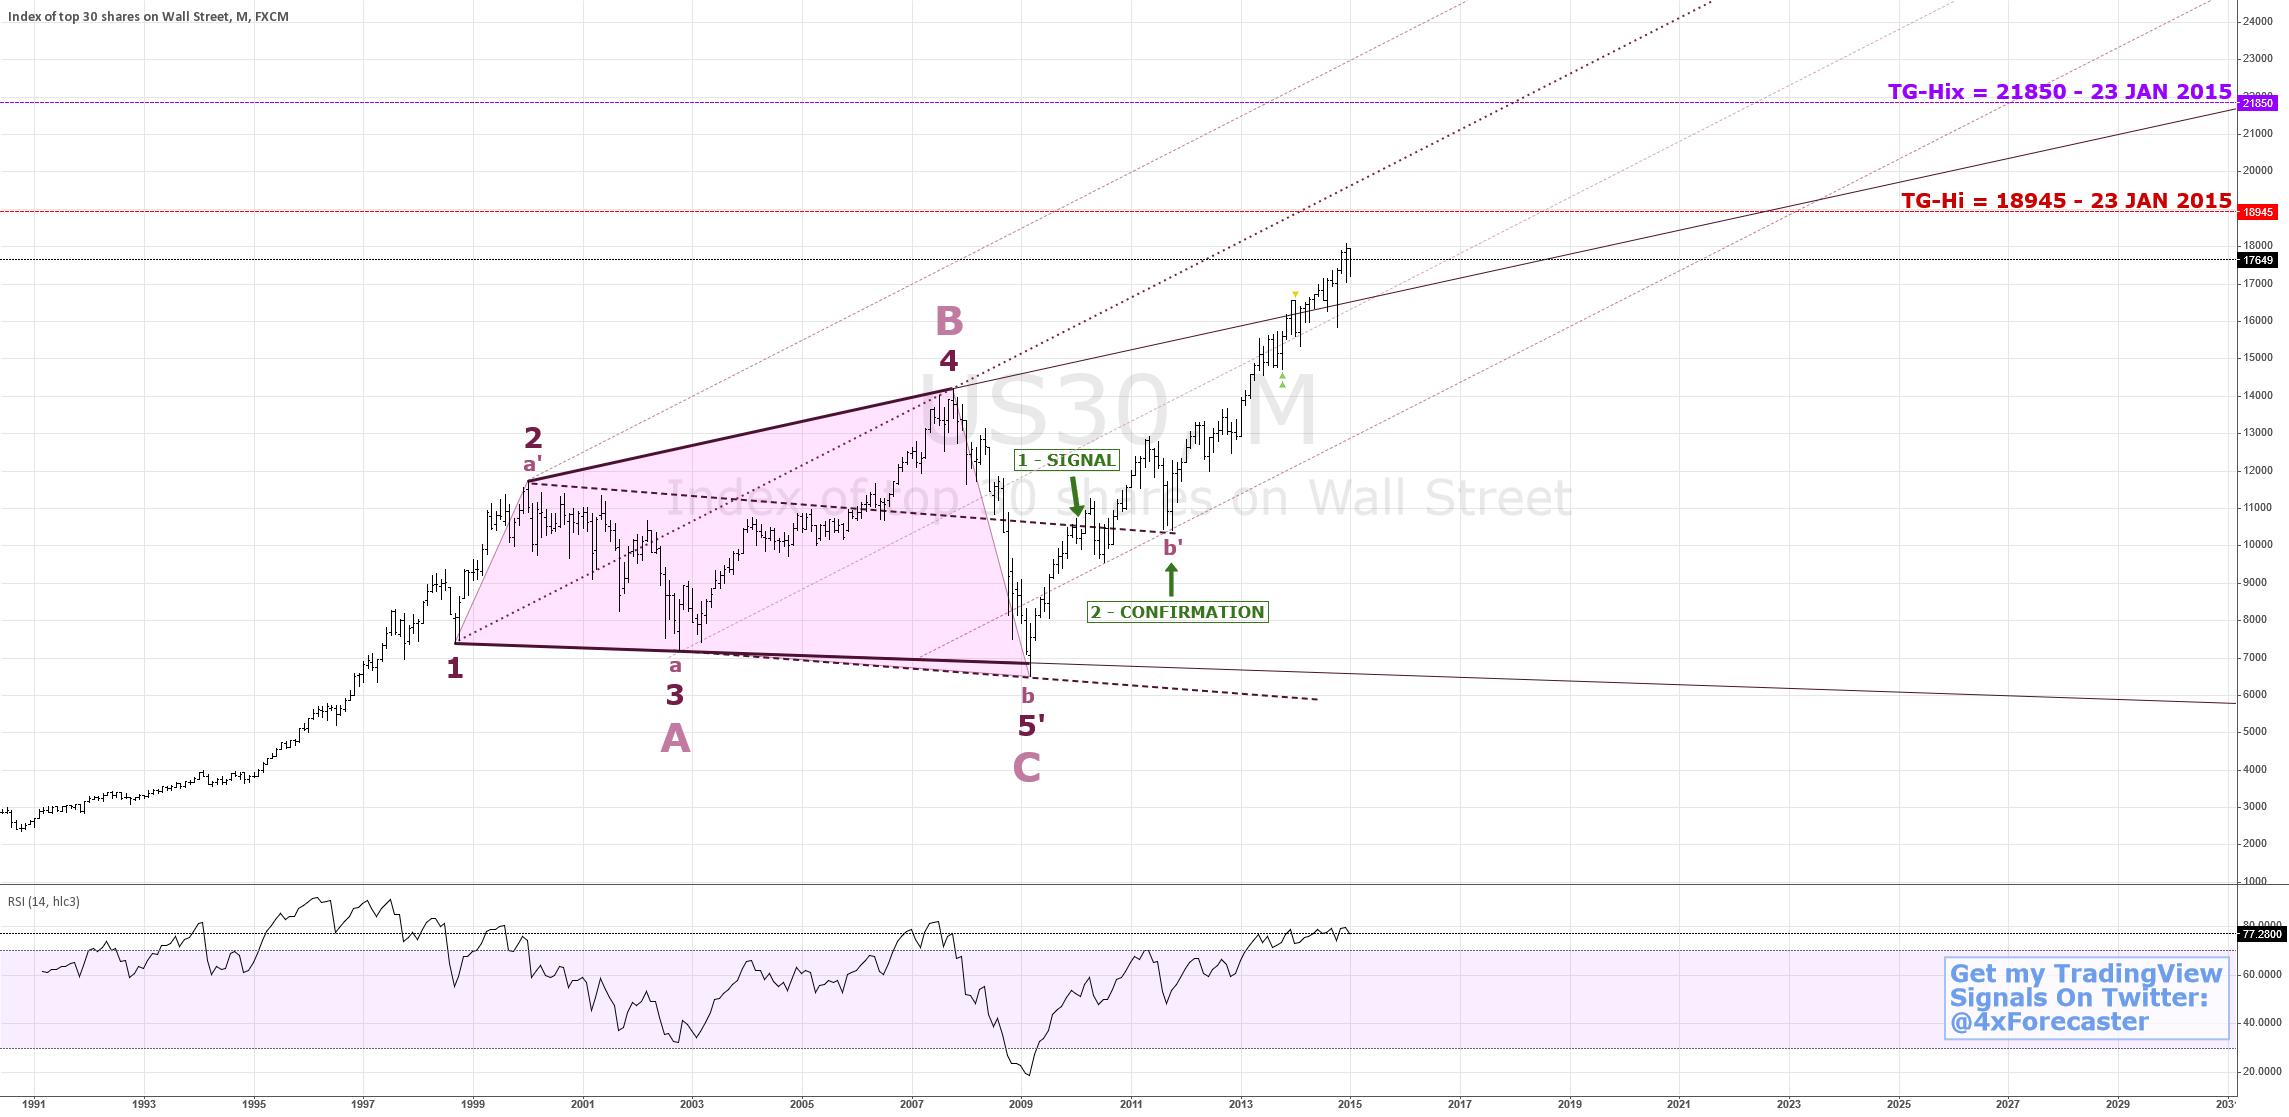 Could $DJIA Rise To 21850? | $SPX $NDX $DJIA $VIX $GLD $SLV